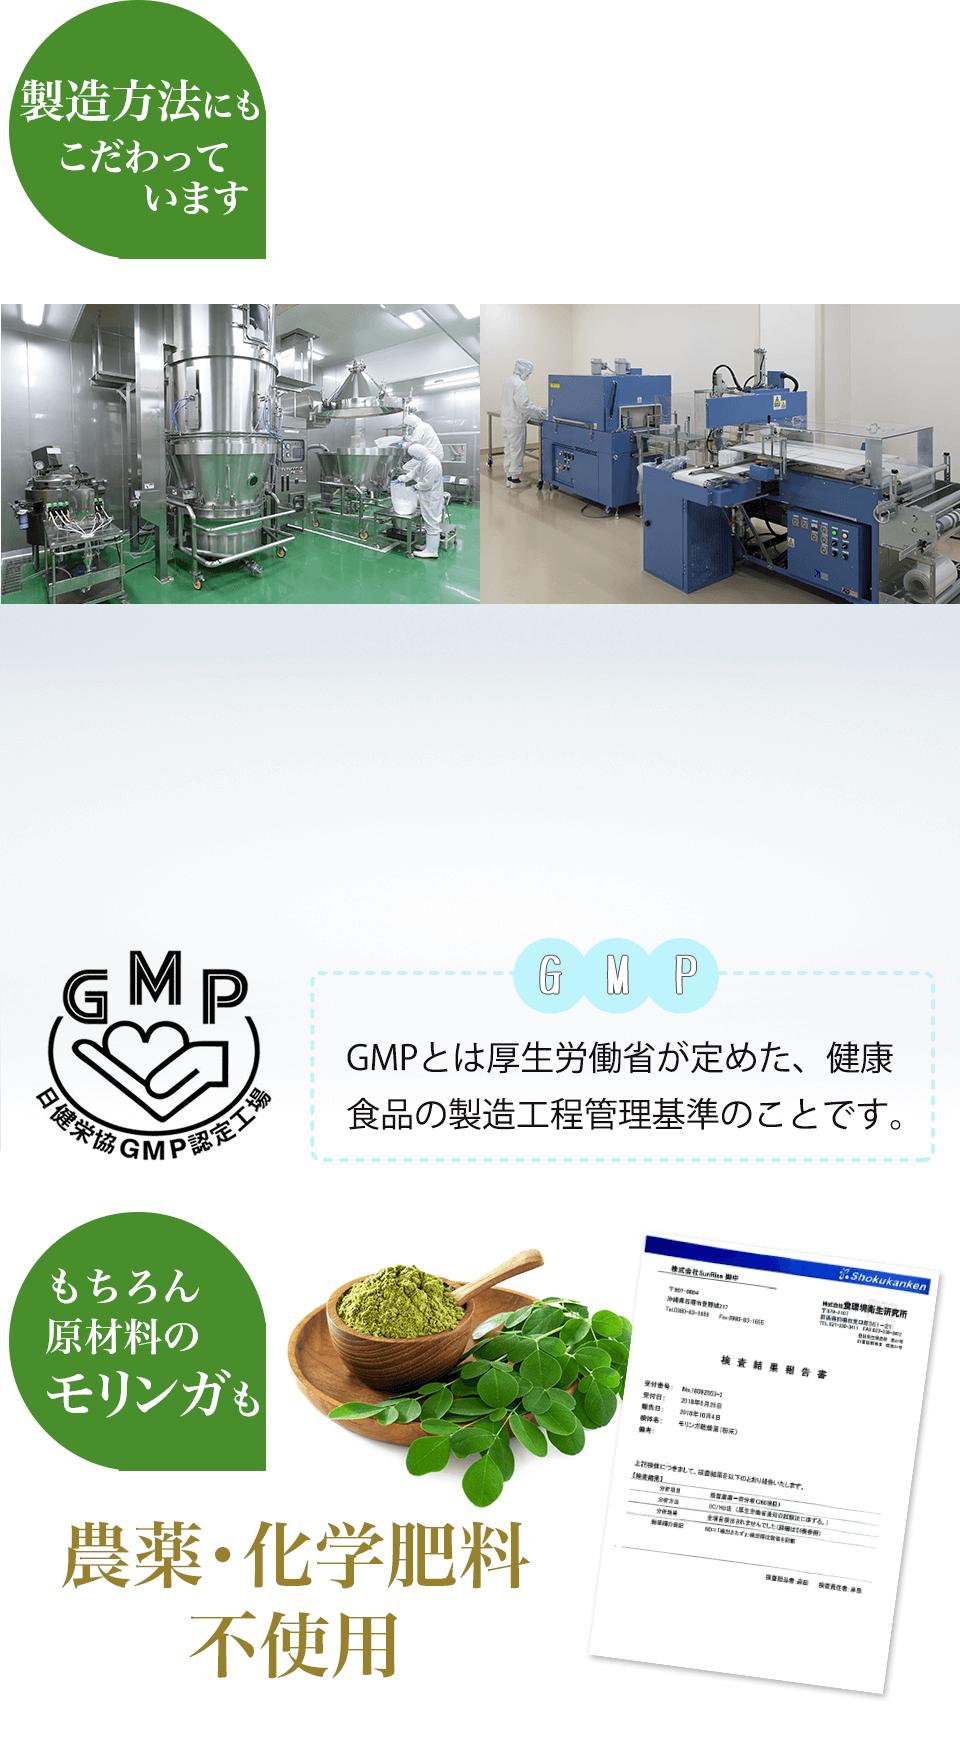 GMP認証取得認証工場で品質管理を徹底され製造